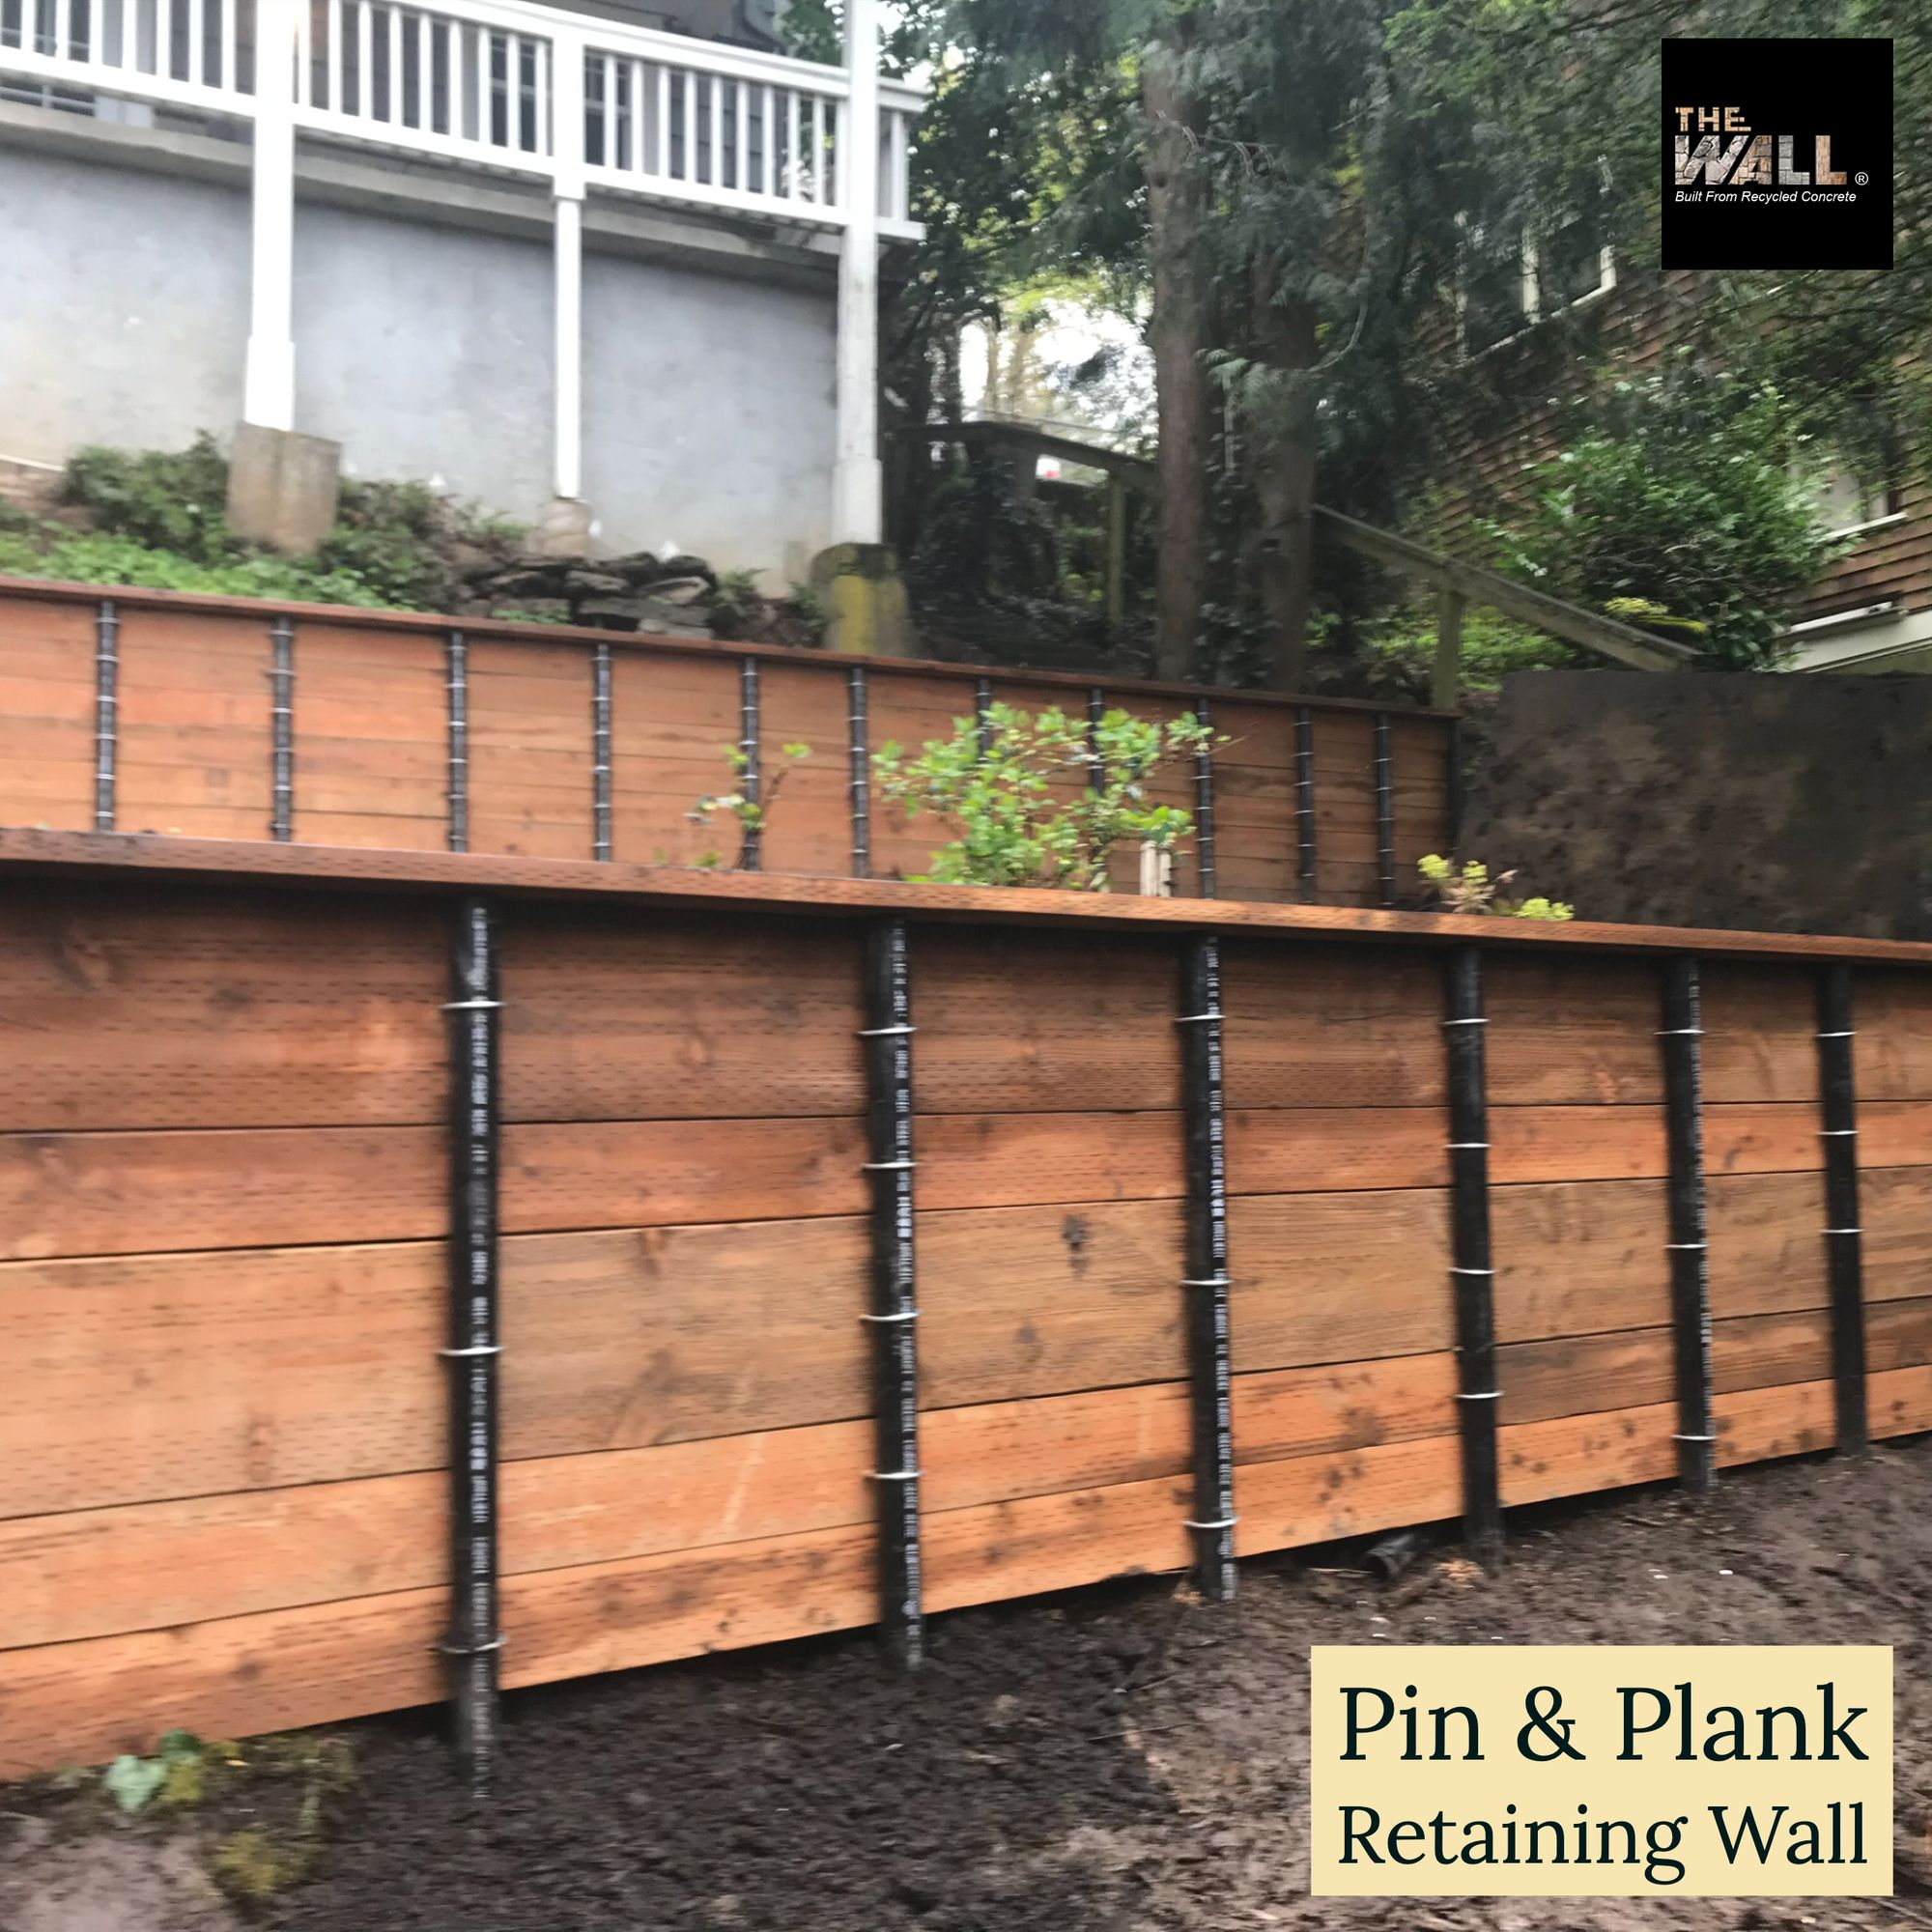 Pin Plank Retaining Wall Landscape Garden Landscaping Outdoorliving Landscapedesign Design Retaining Wall Concrete Retaining Walls Recycled Concrete